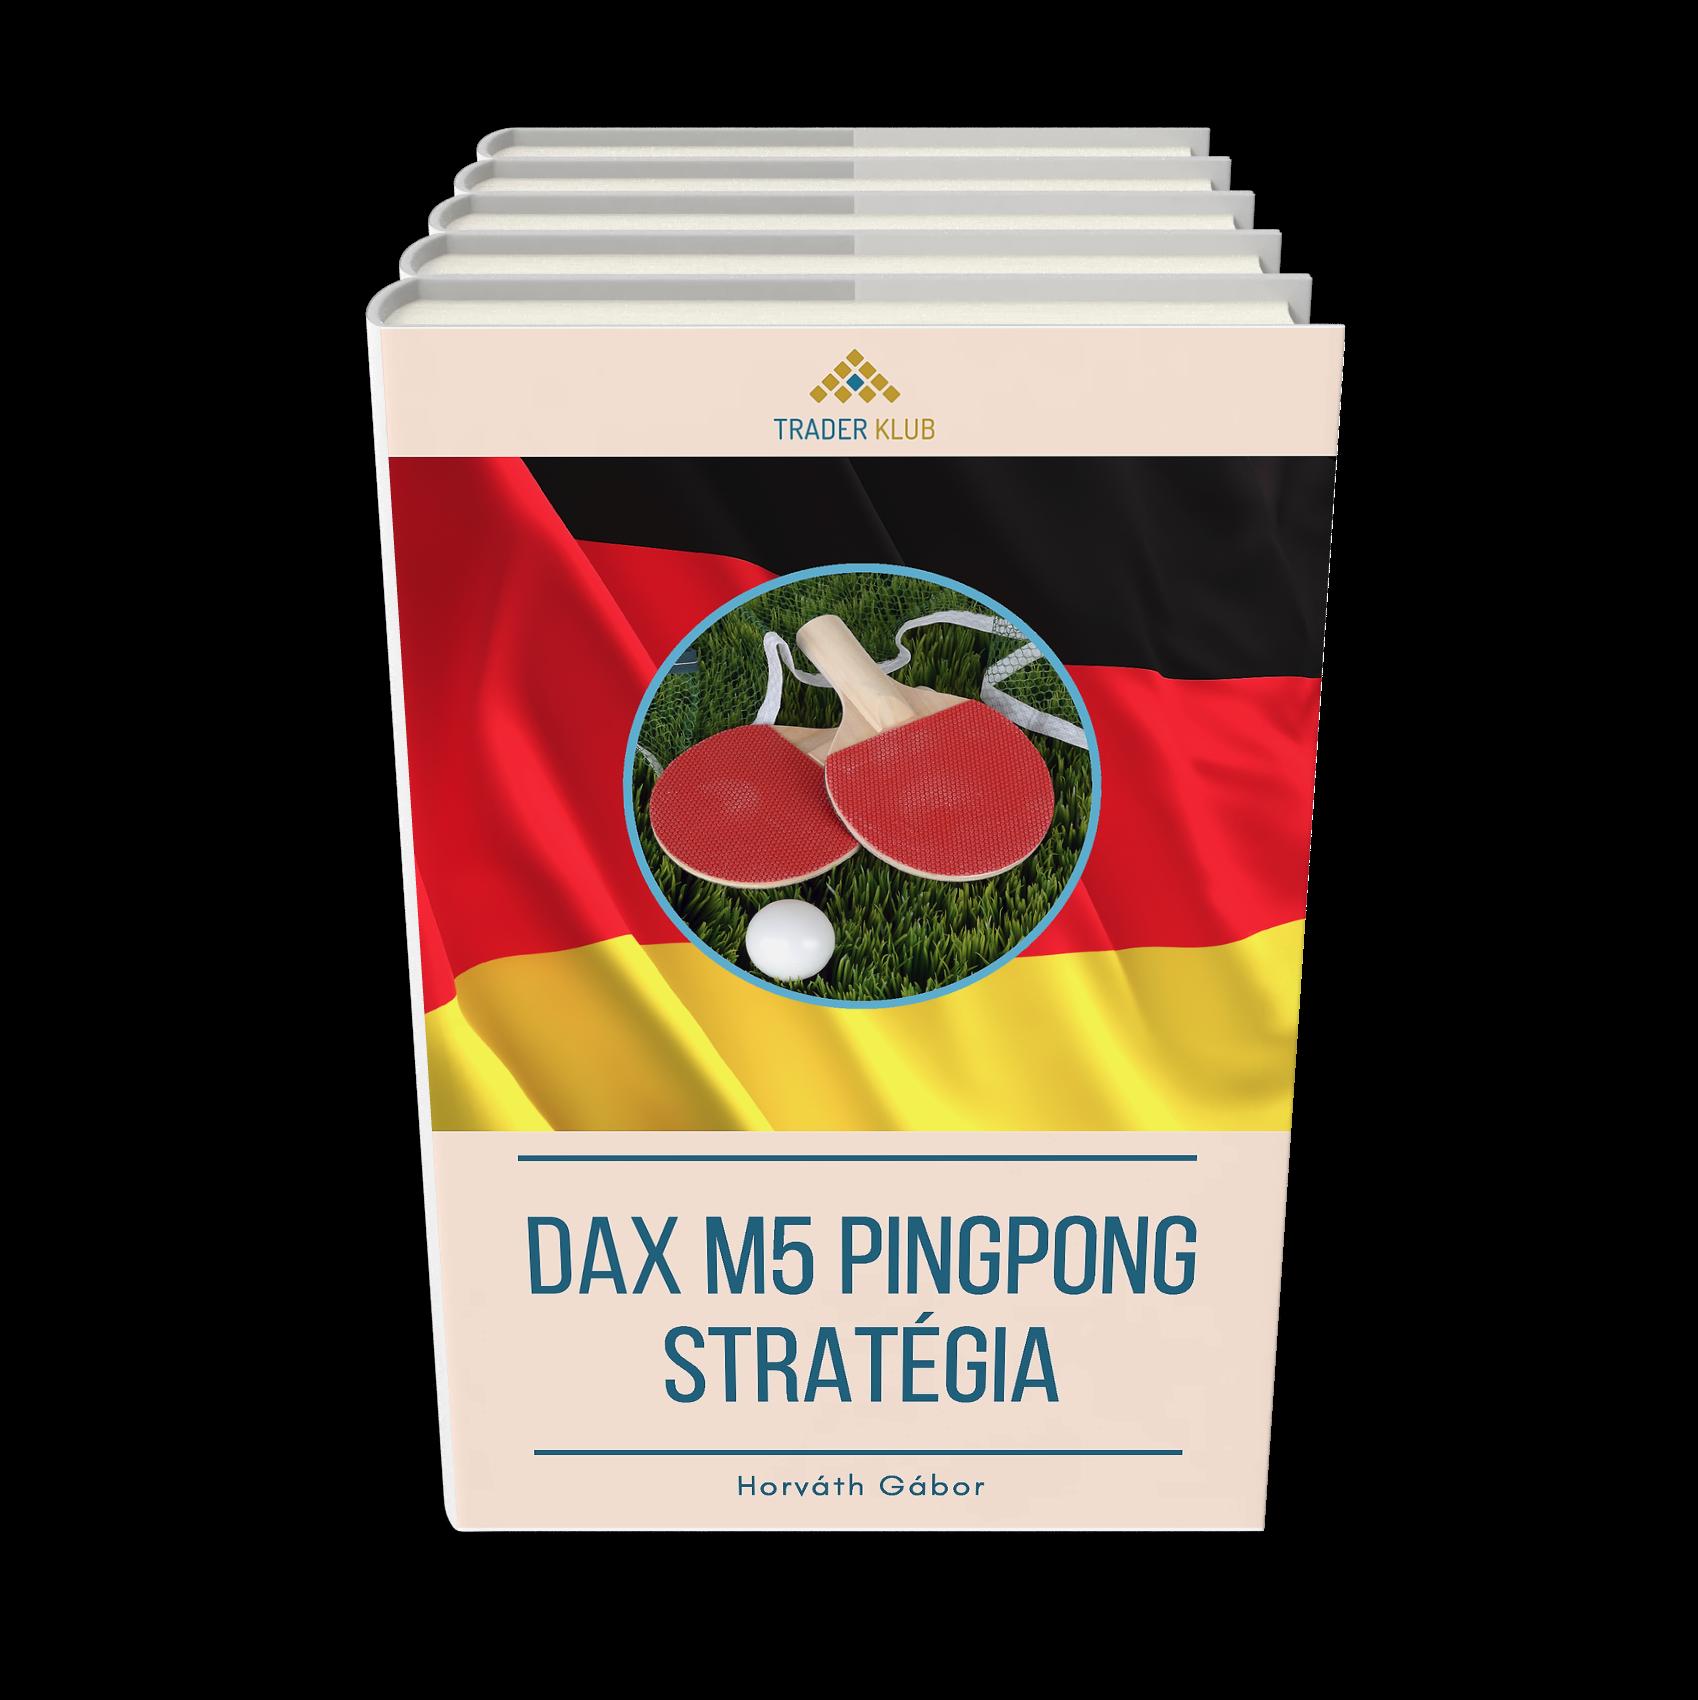 A DAX M5 Pingpong stratégia